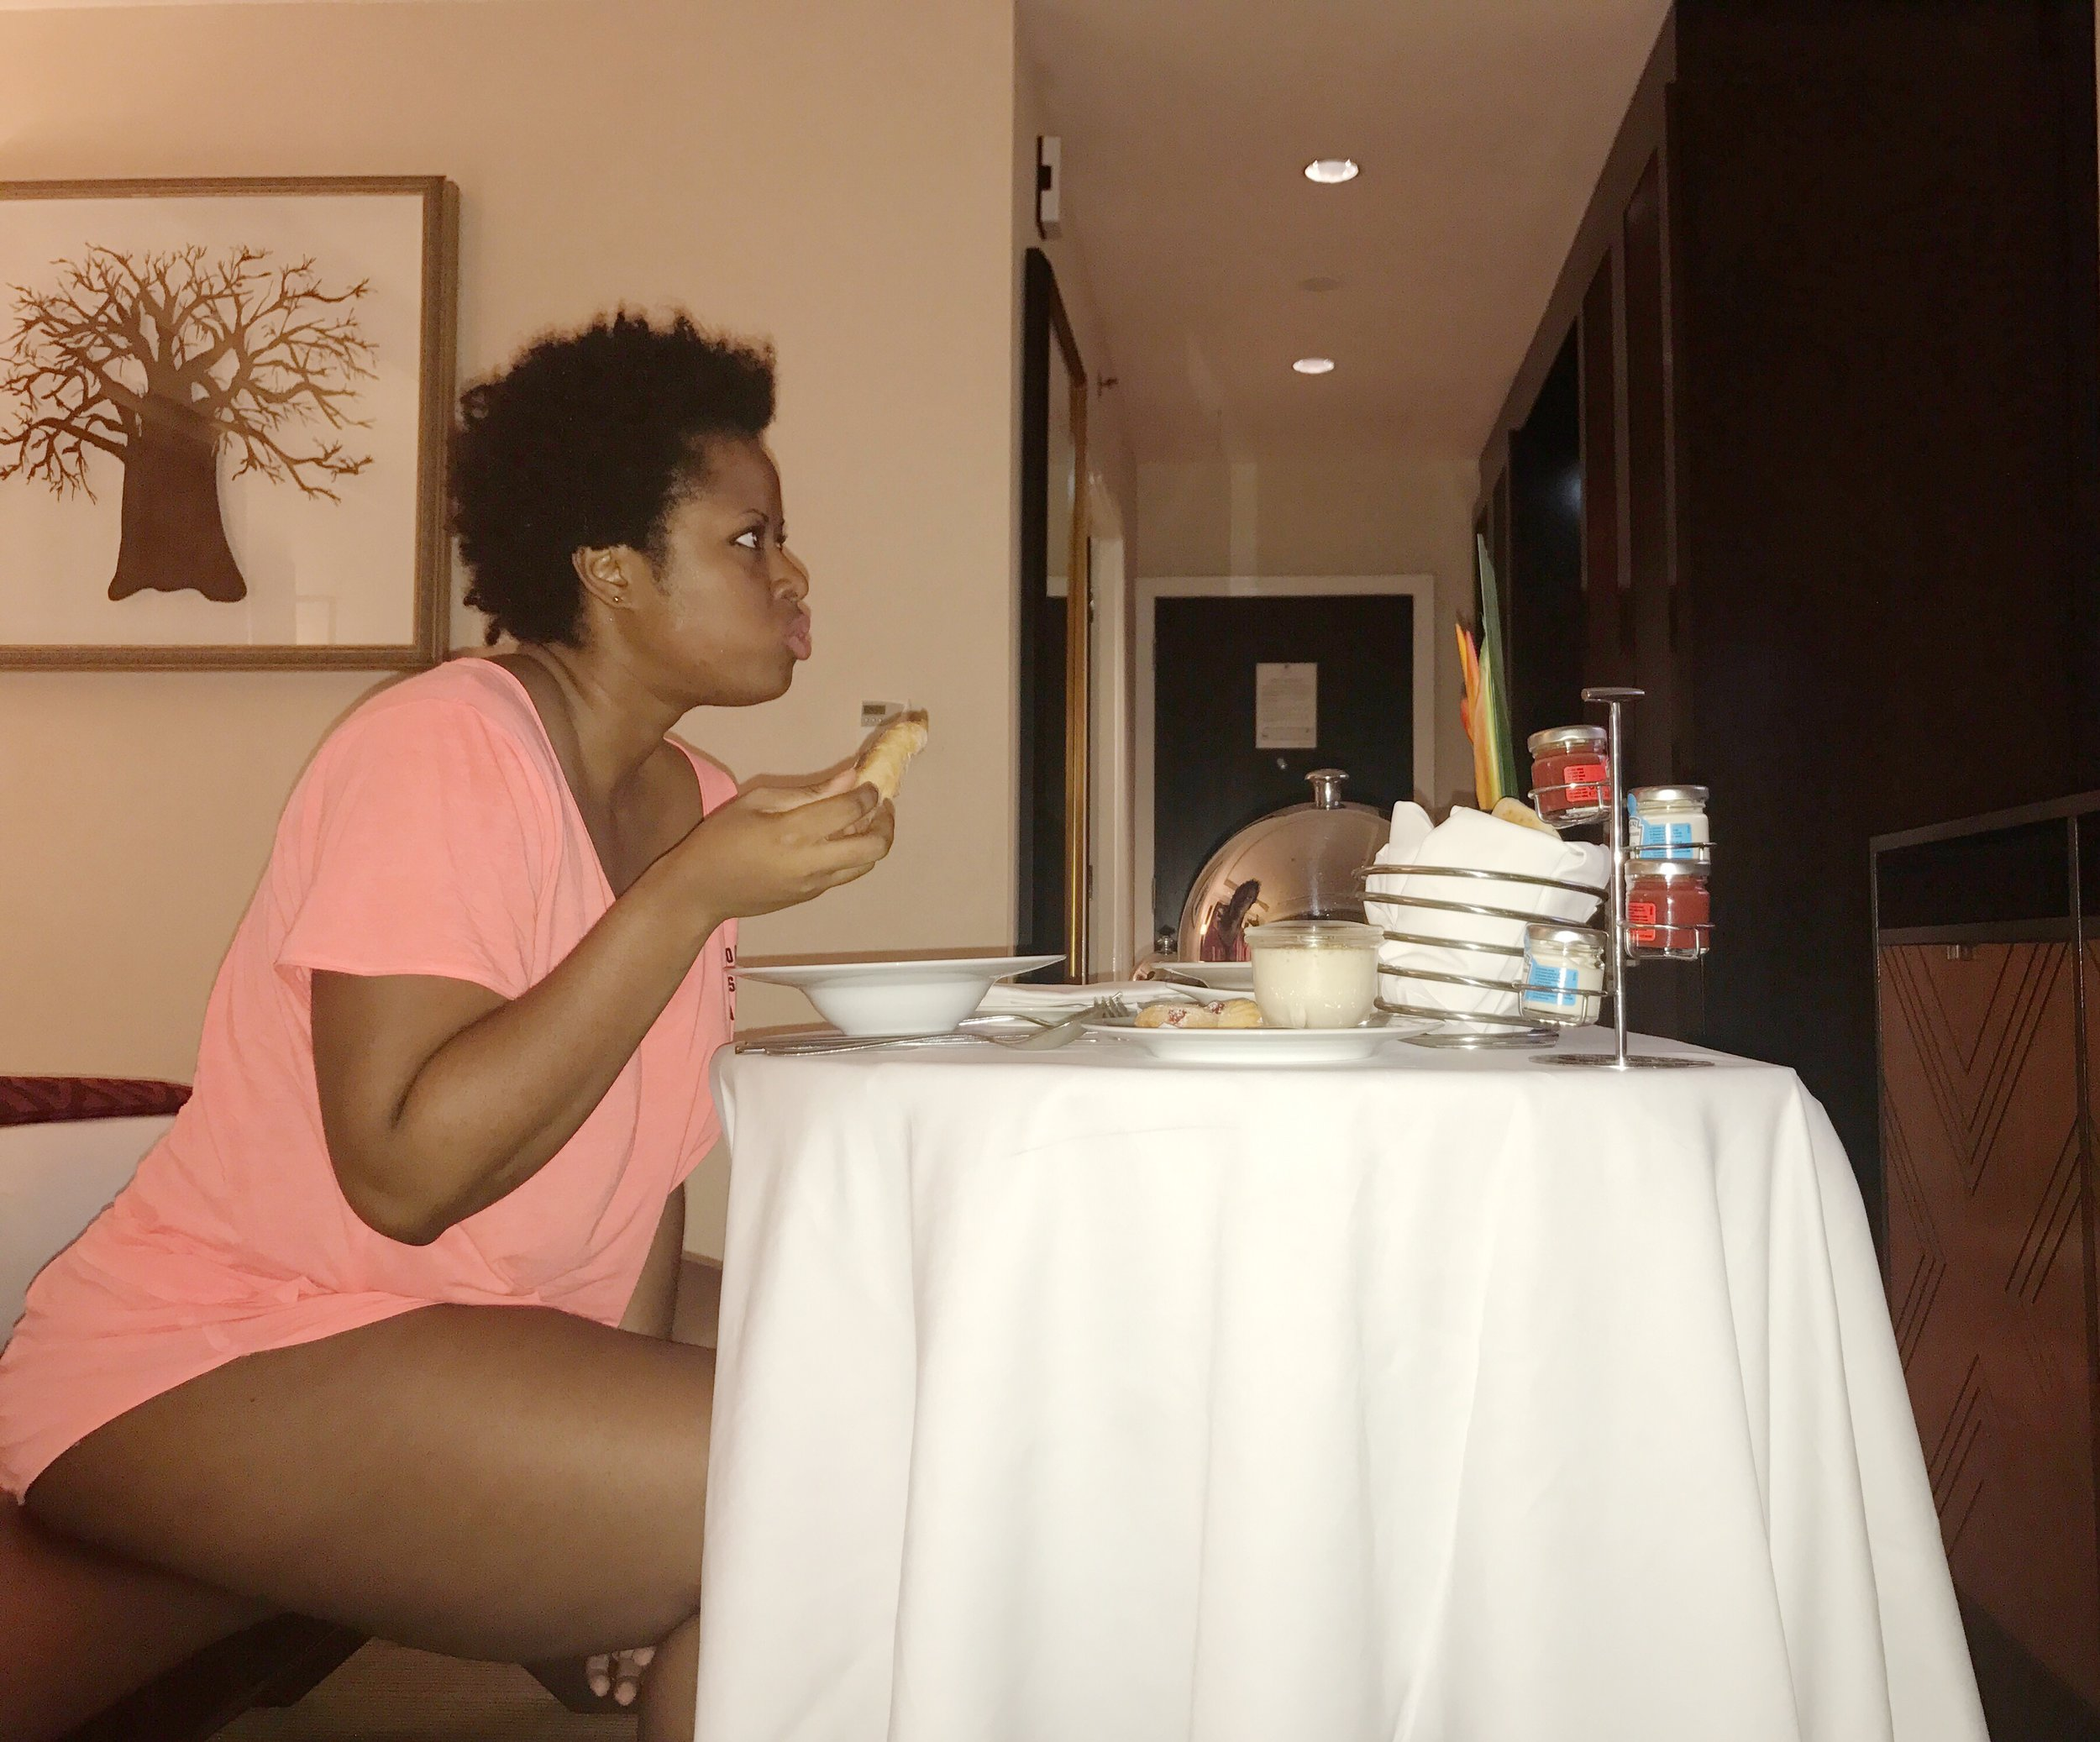 Kempinski-Goldcoast-Accra-Hotel-Review-Photos-vickieremoeofficial21.JPG